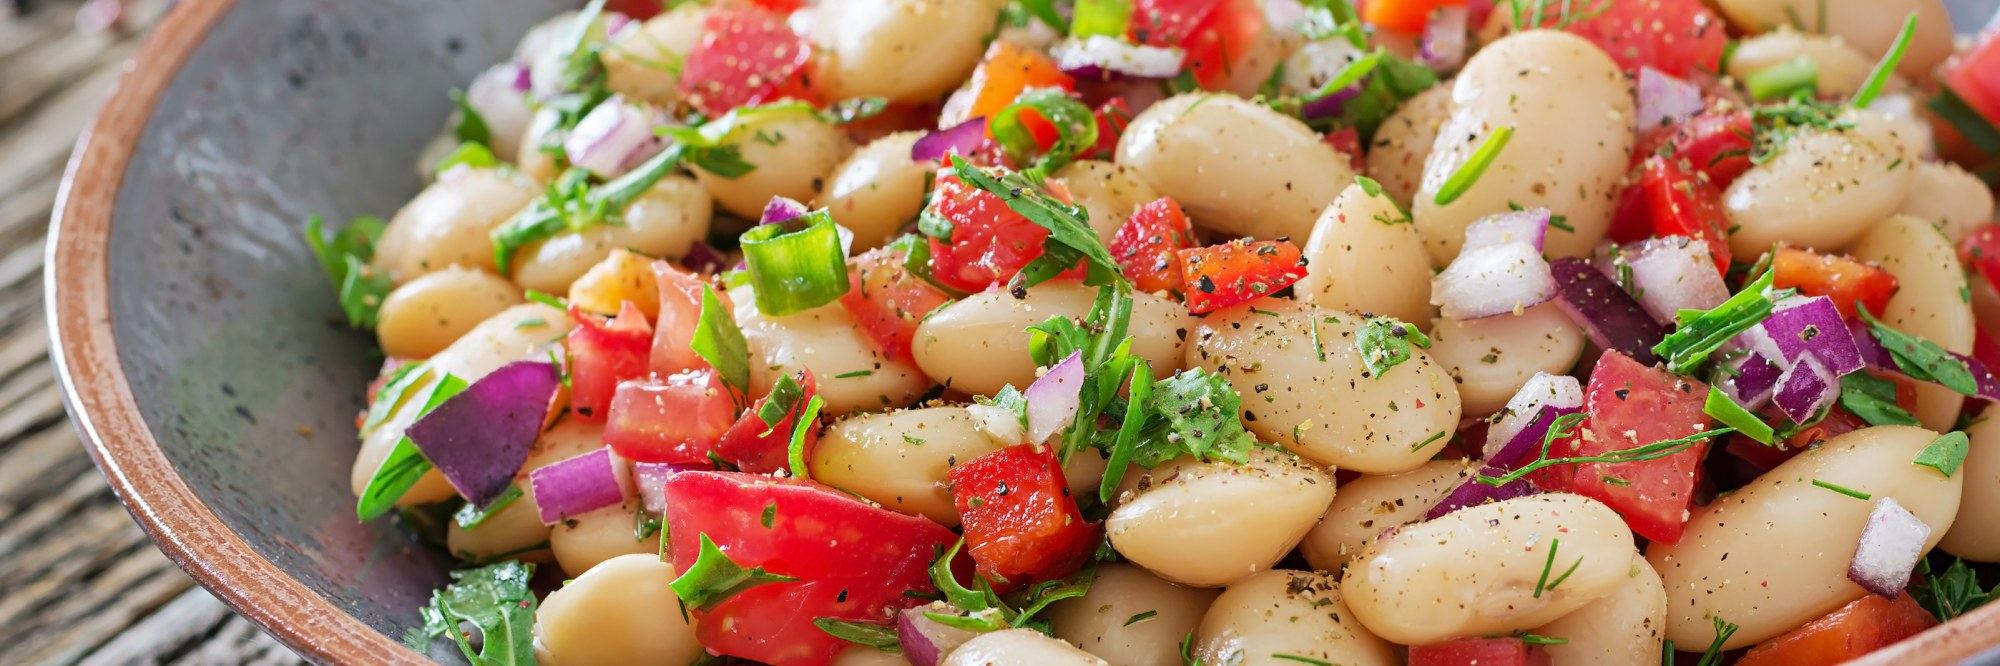 Afbeelding salade